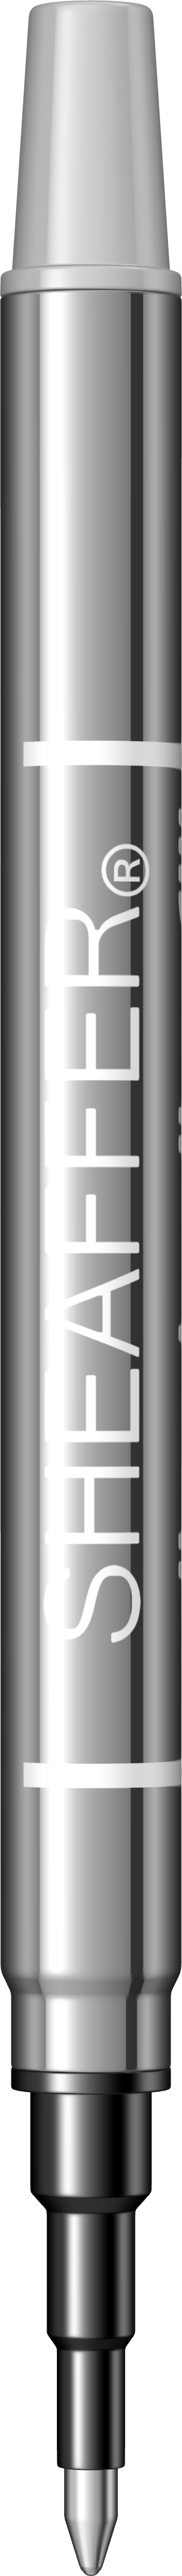 Skrip Classic-612